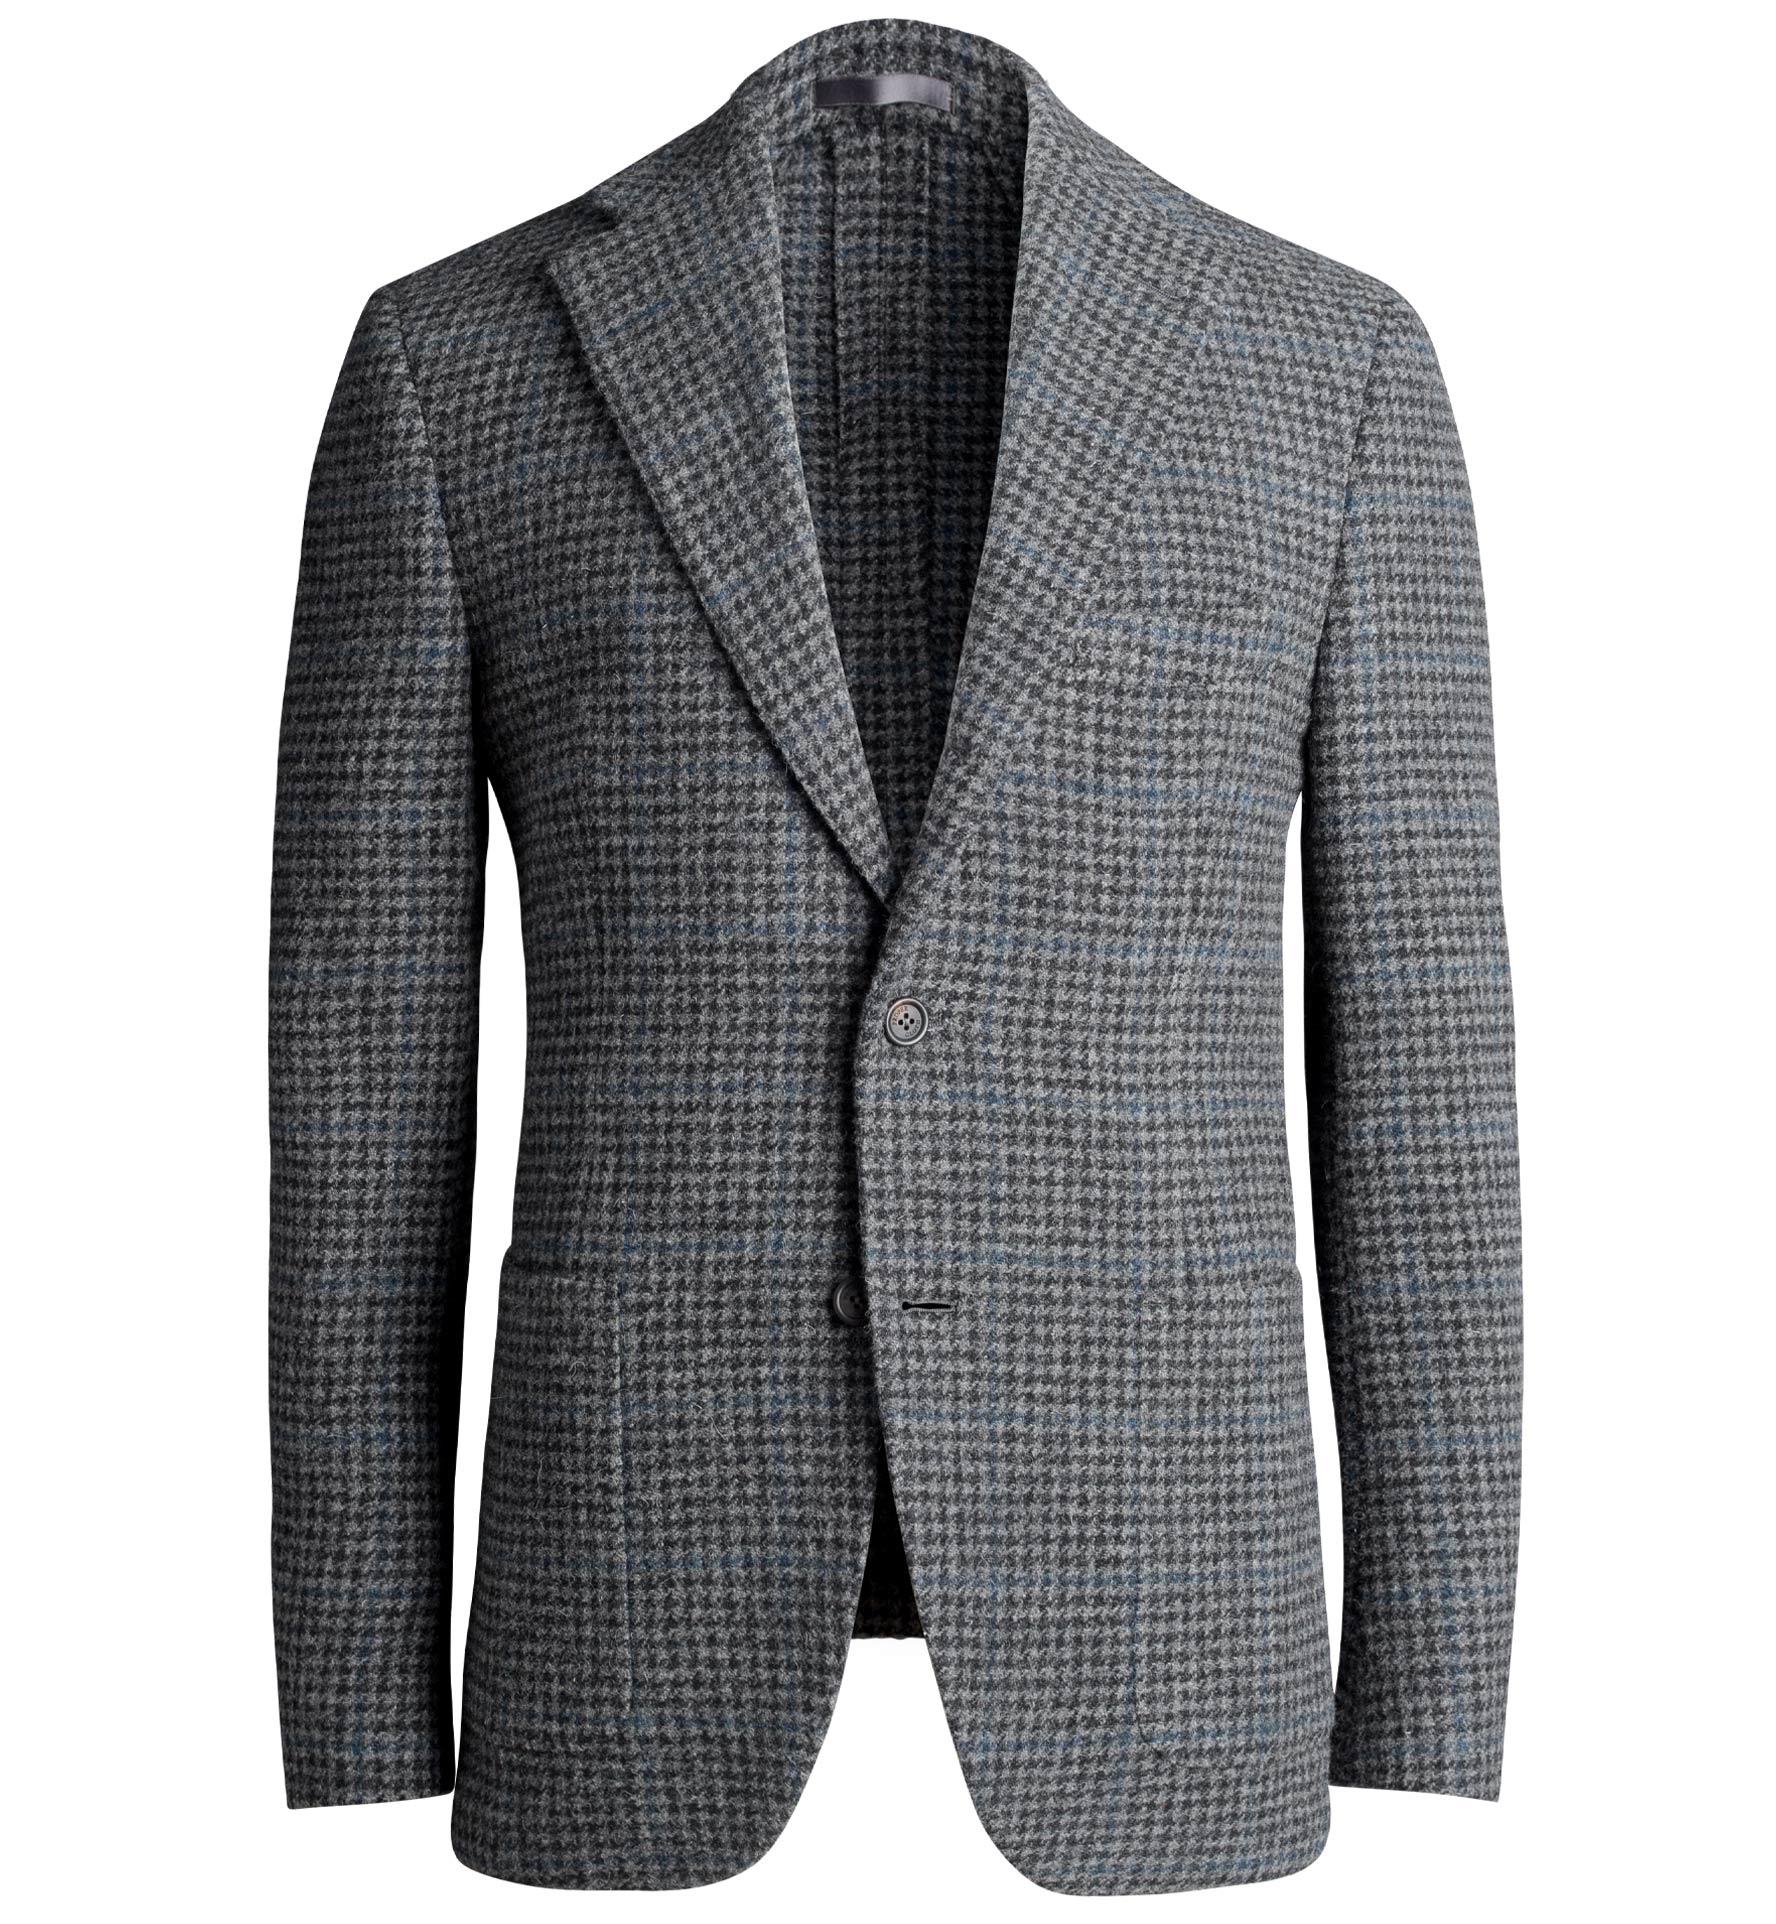 Zoom Image of Waverly Grey Houndstooth Heavy Tweed Jacket